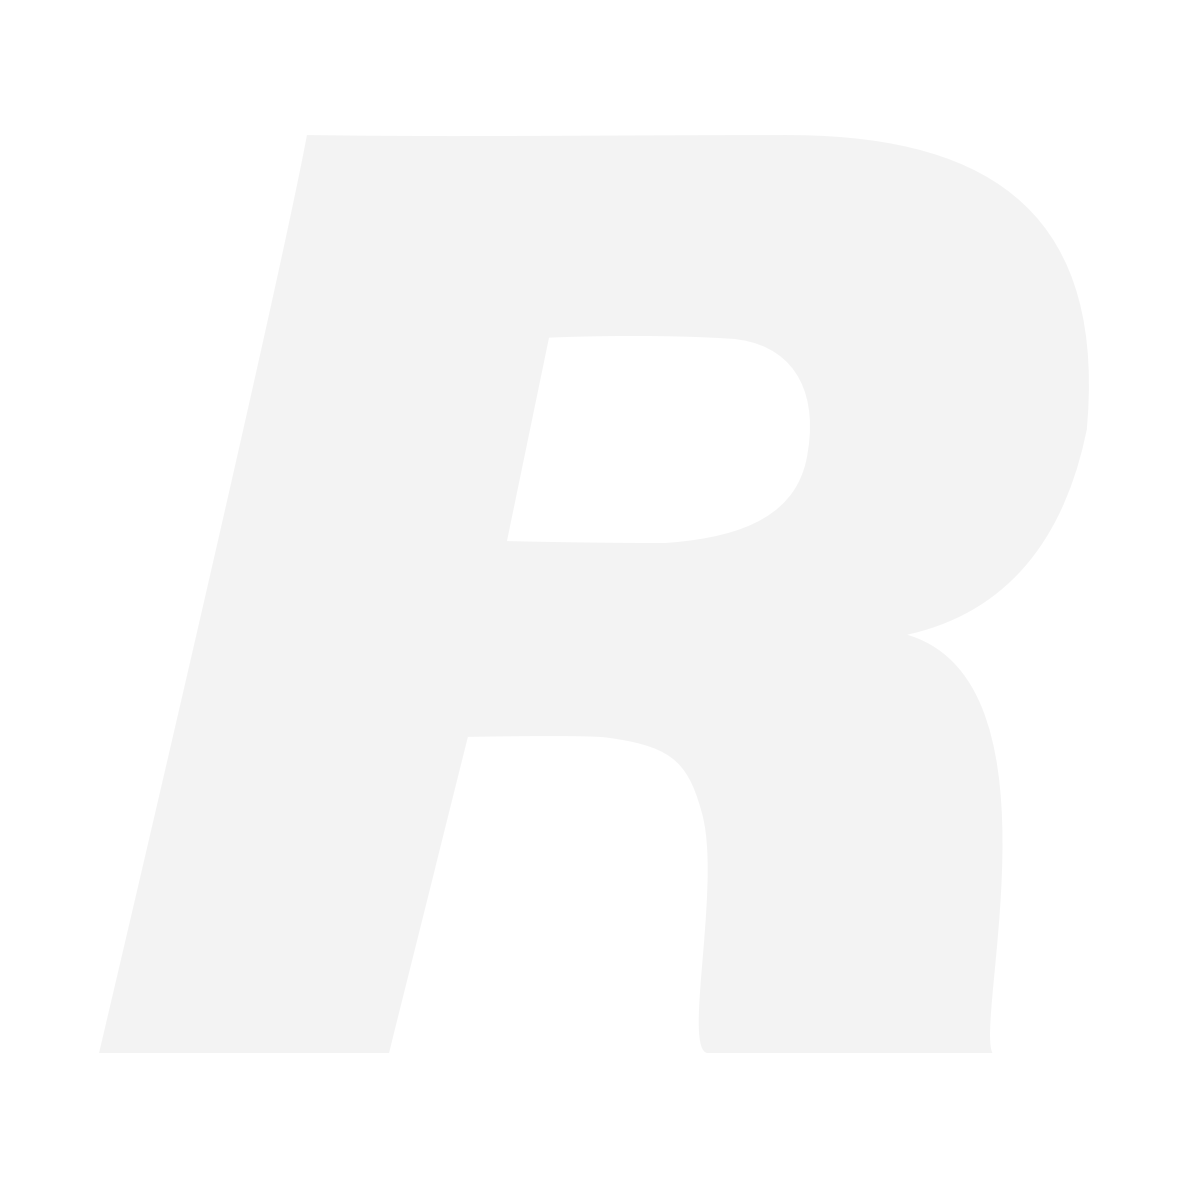 Köp Sony A7R Mark II, byt in din gamla Canon EOS 5D Mark III